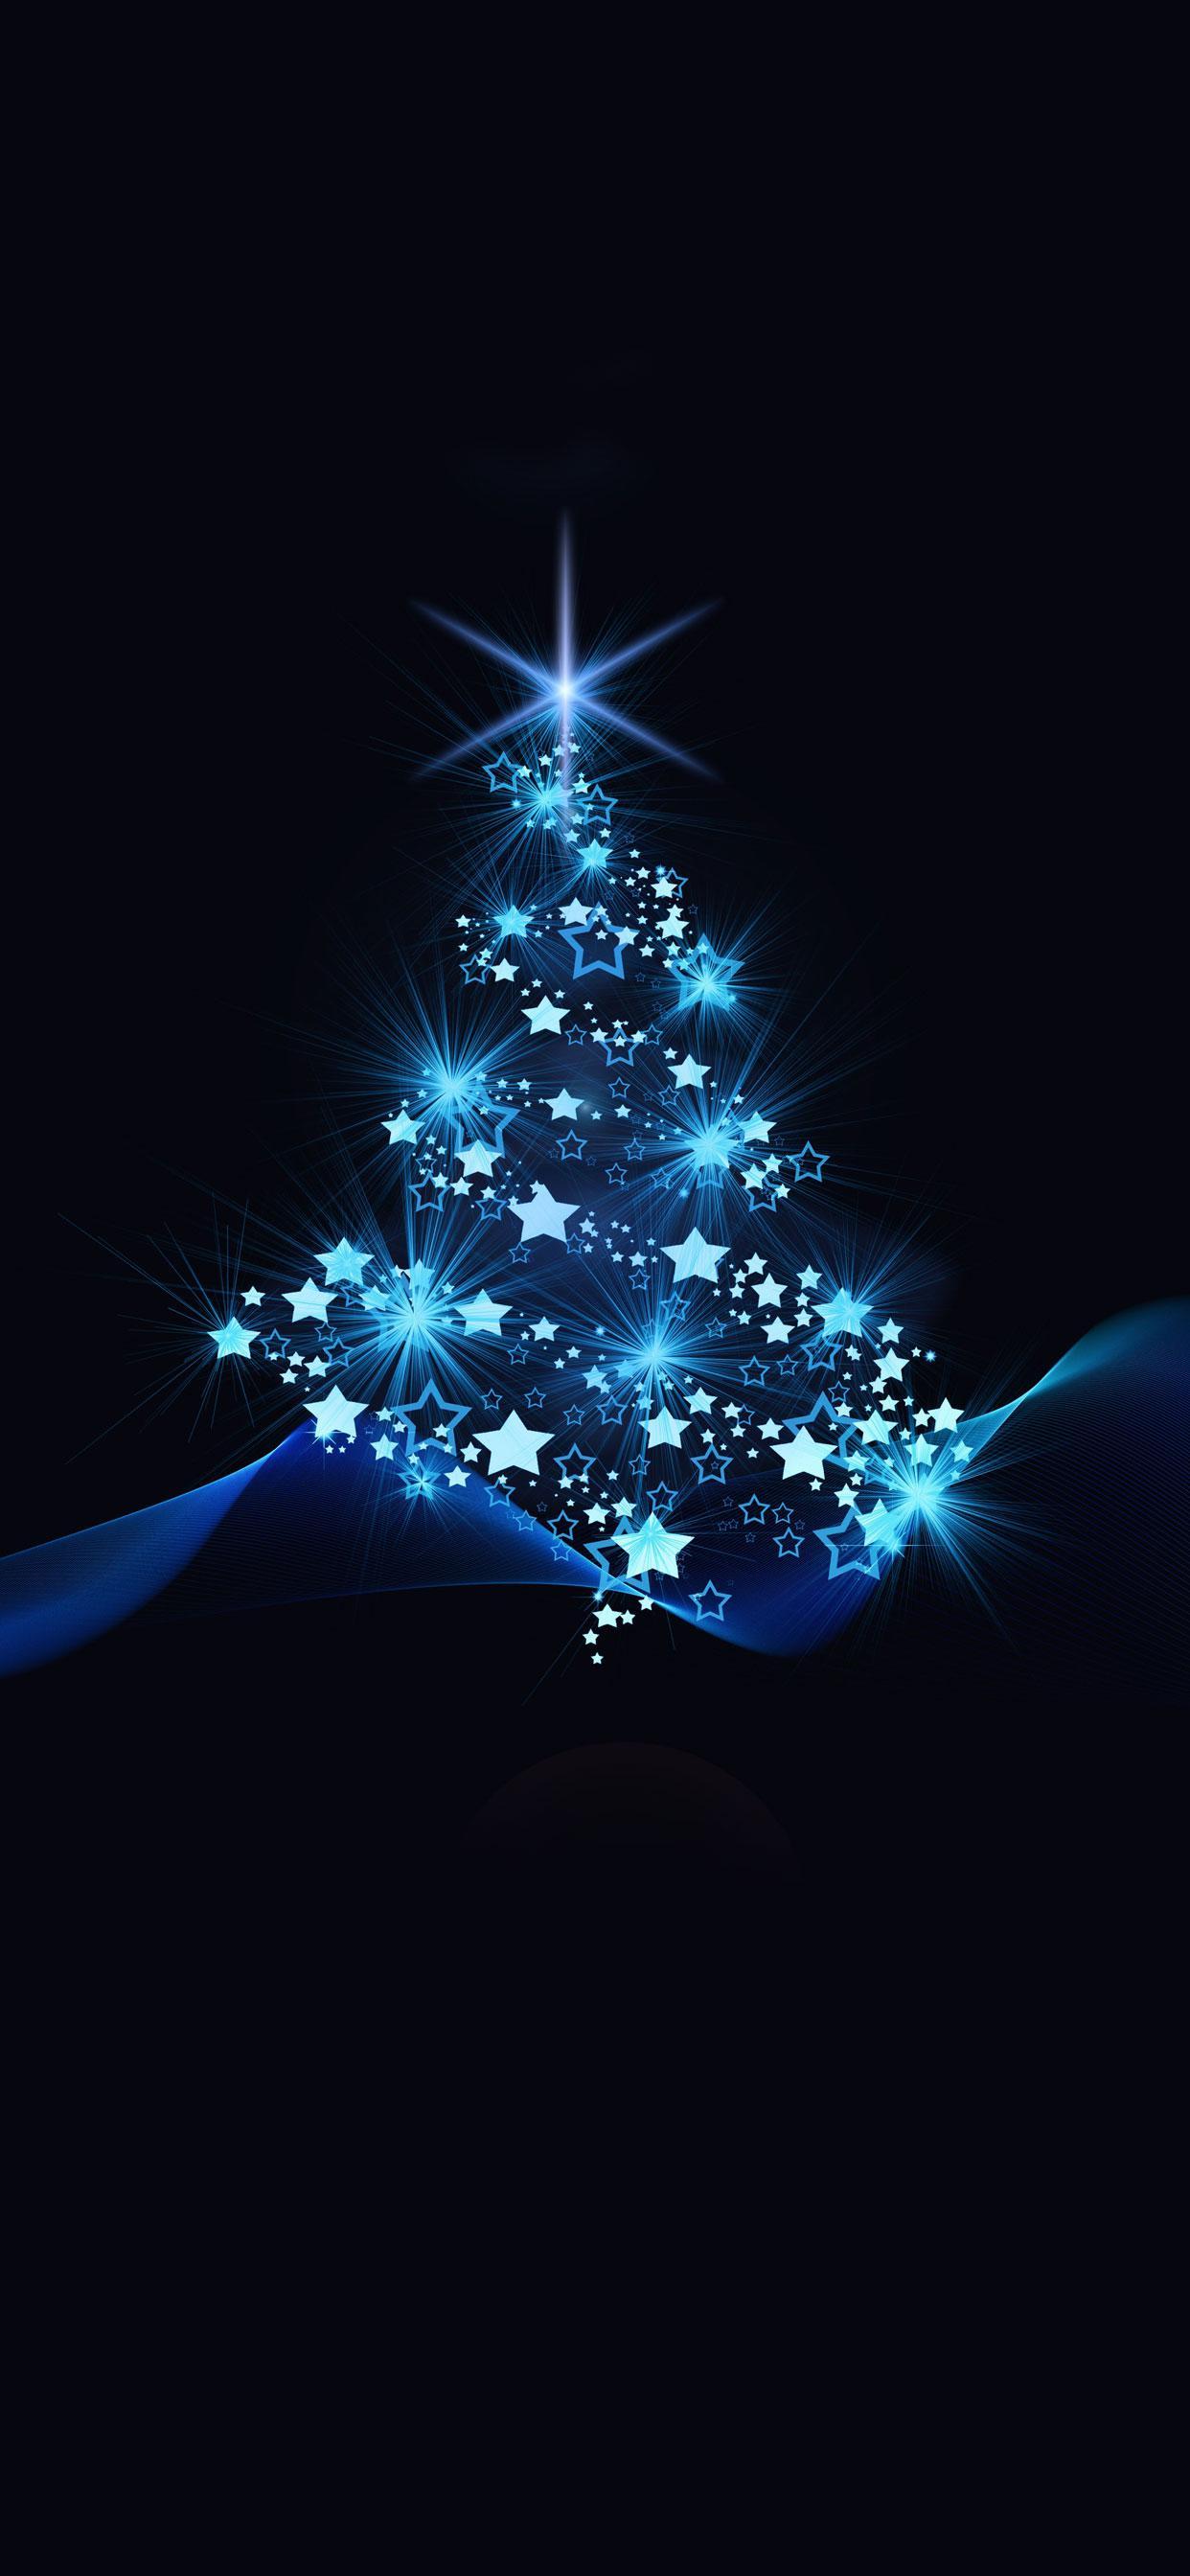 عکس زمینه درخت کریسمس آبی پس زمینه